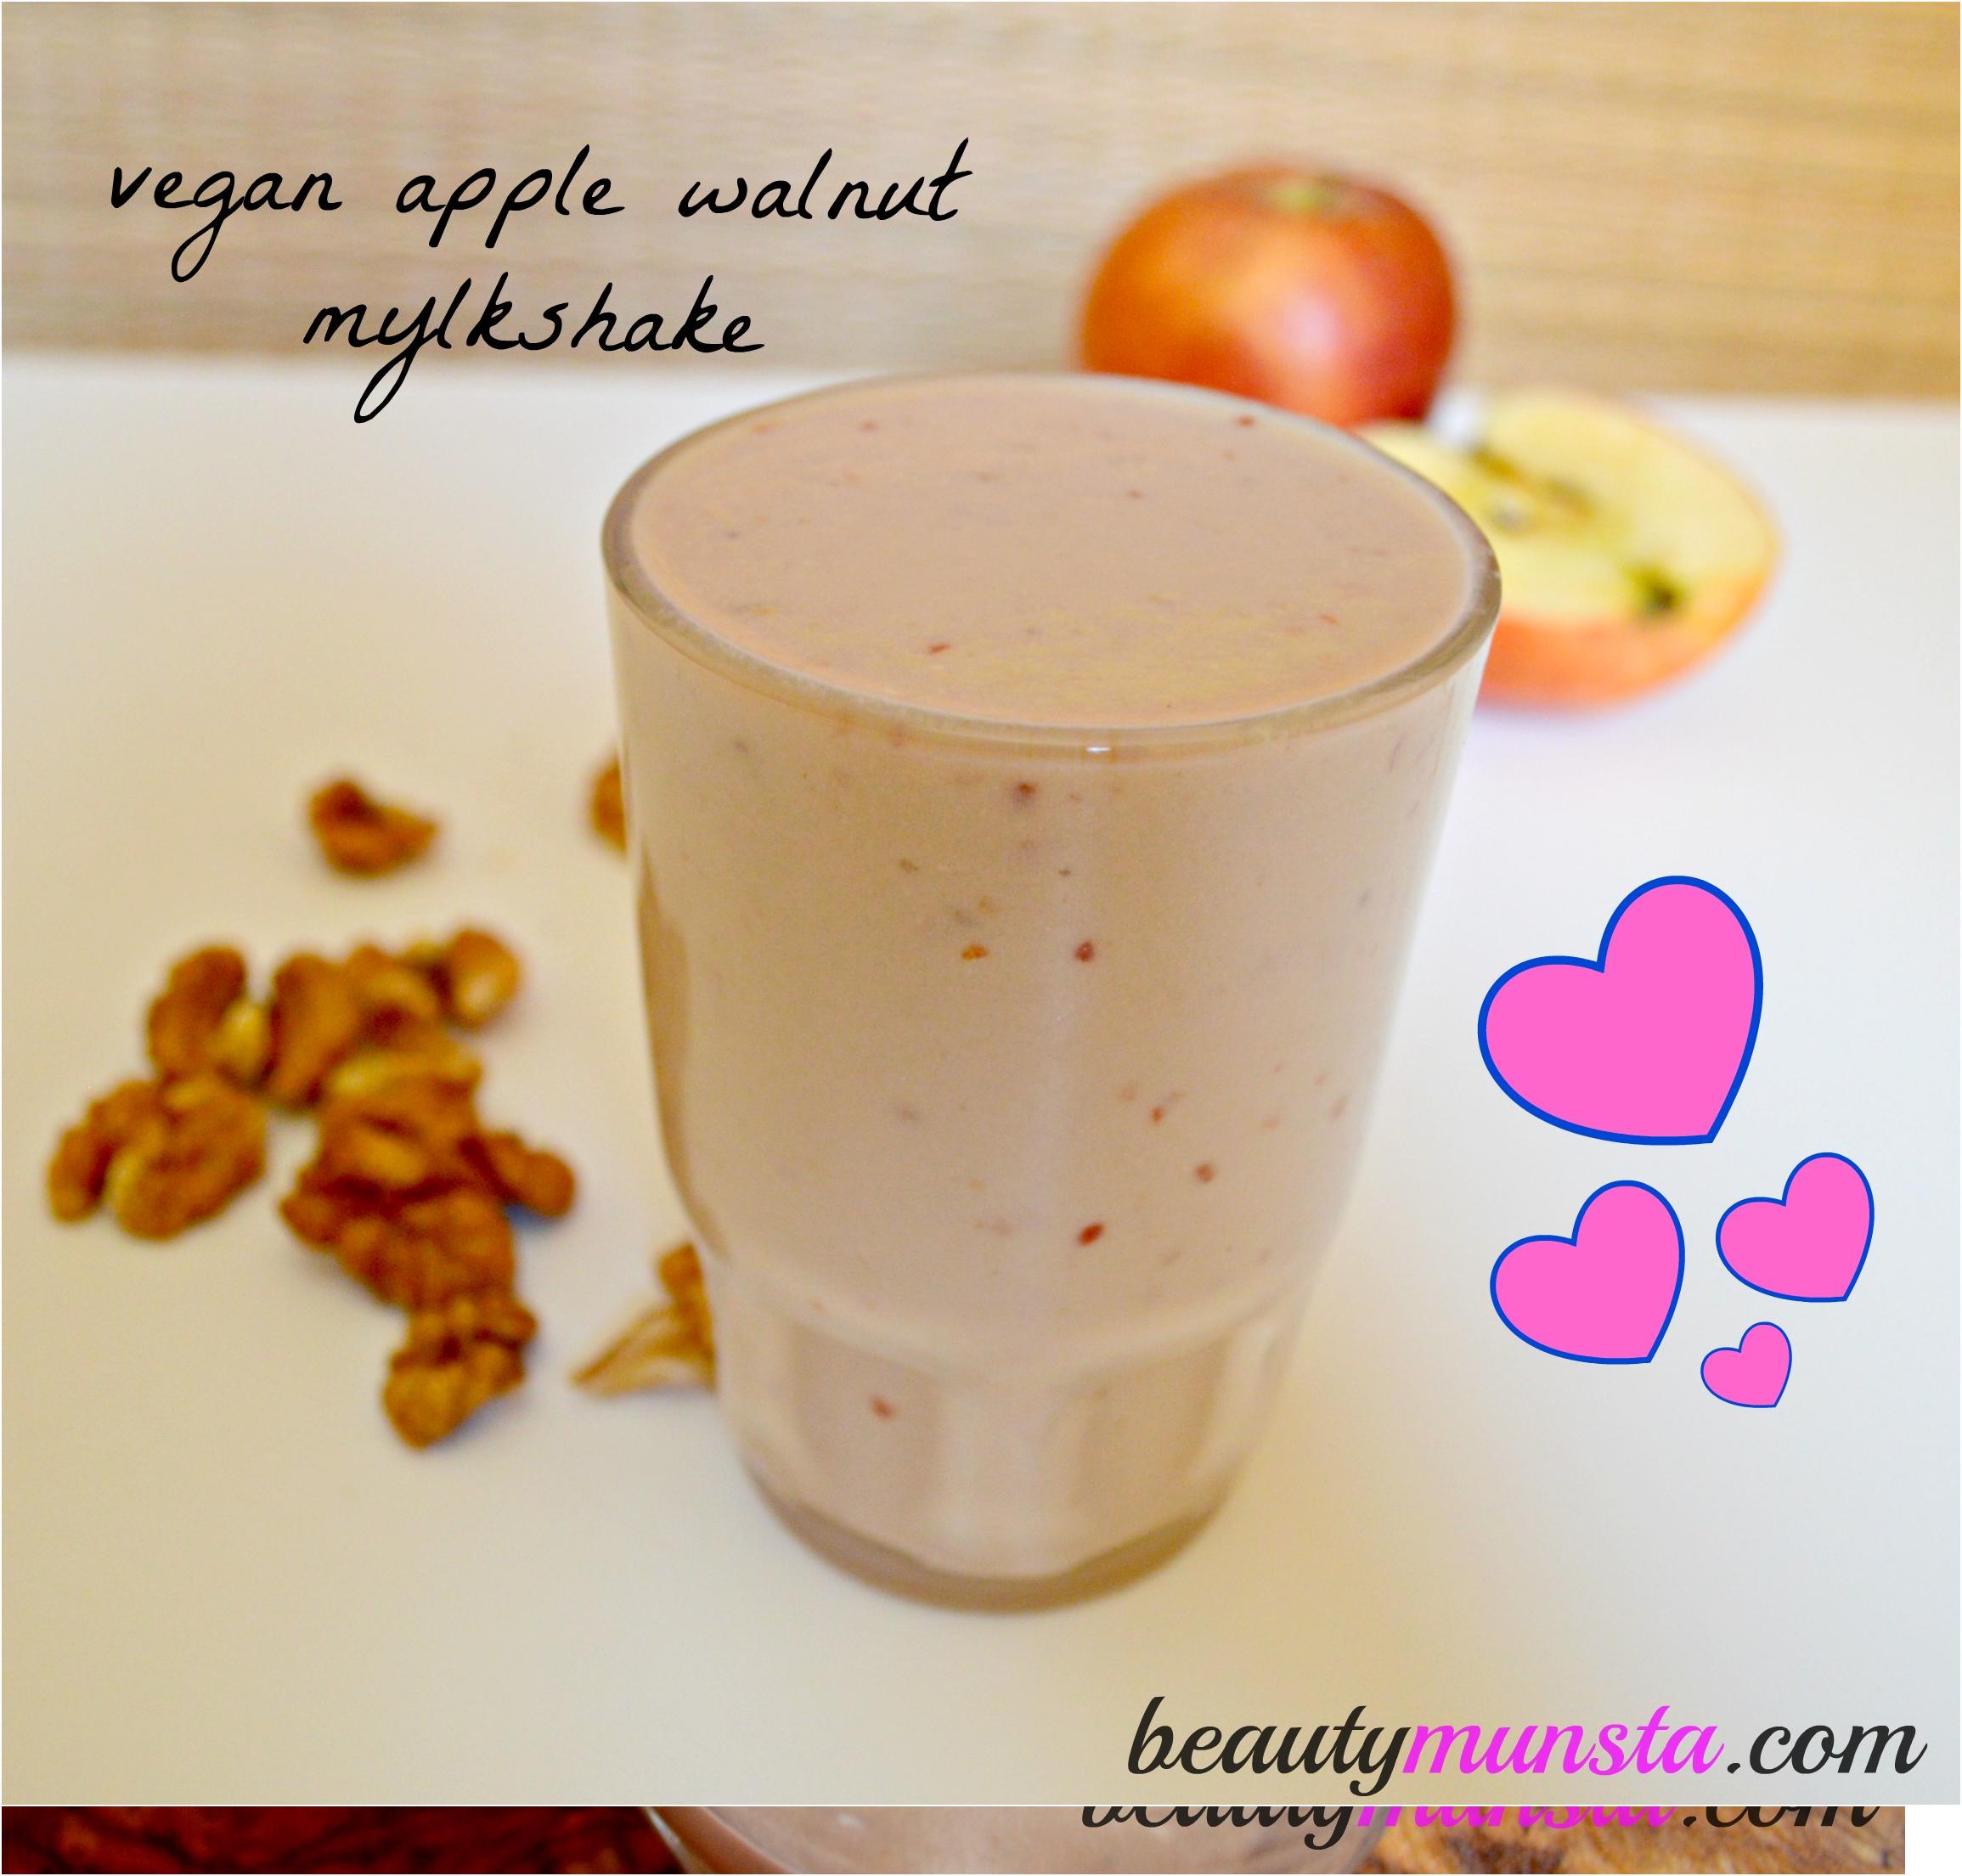 Thick & creamy: Vegan apple walnut milkshake!